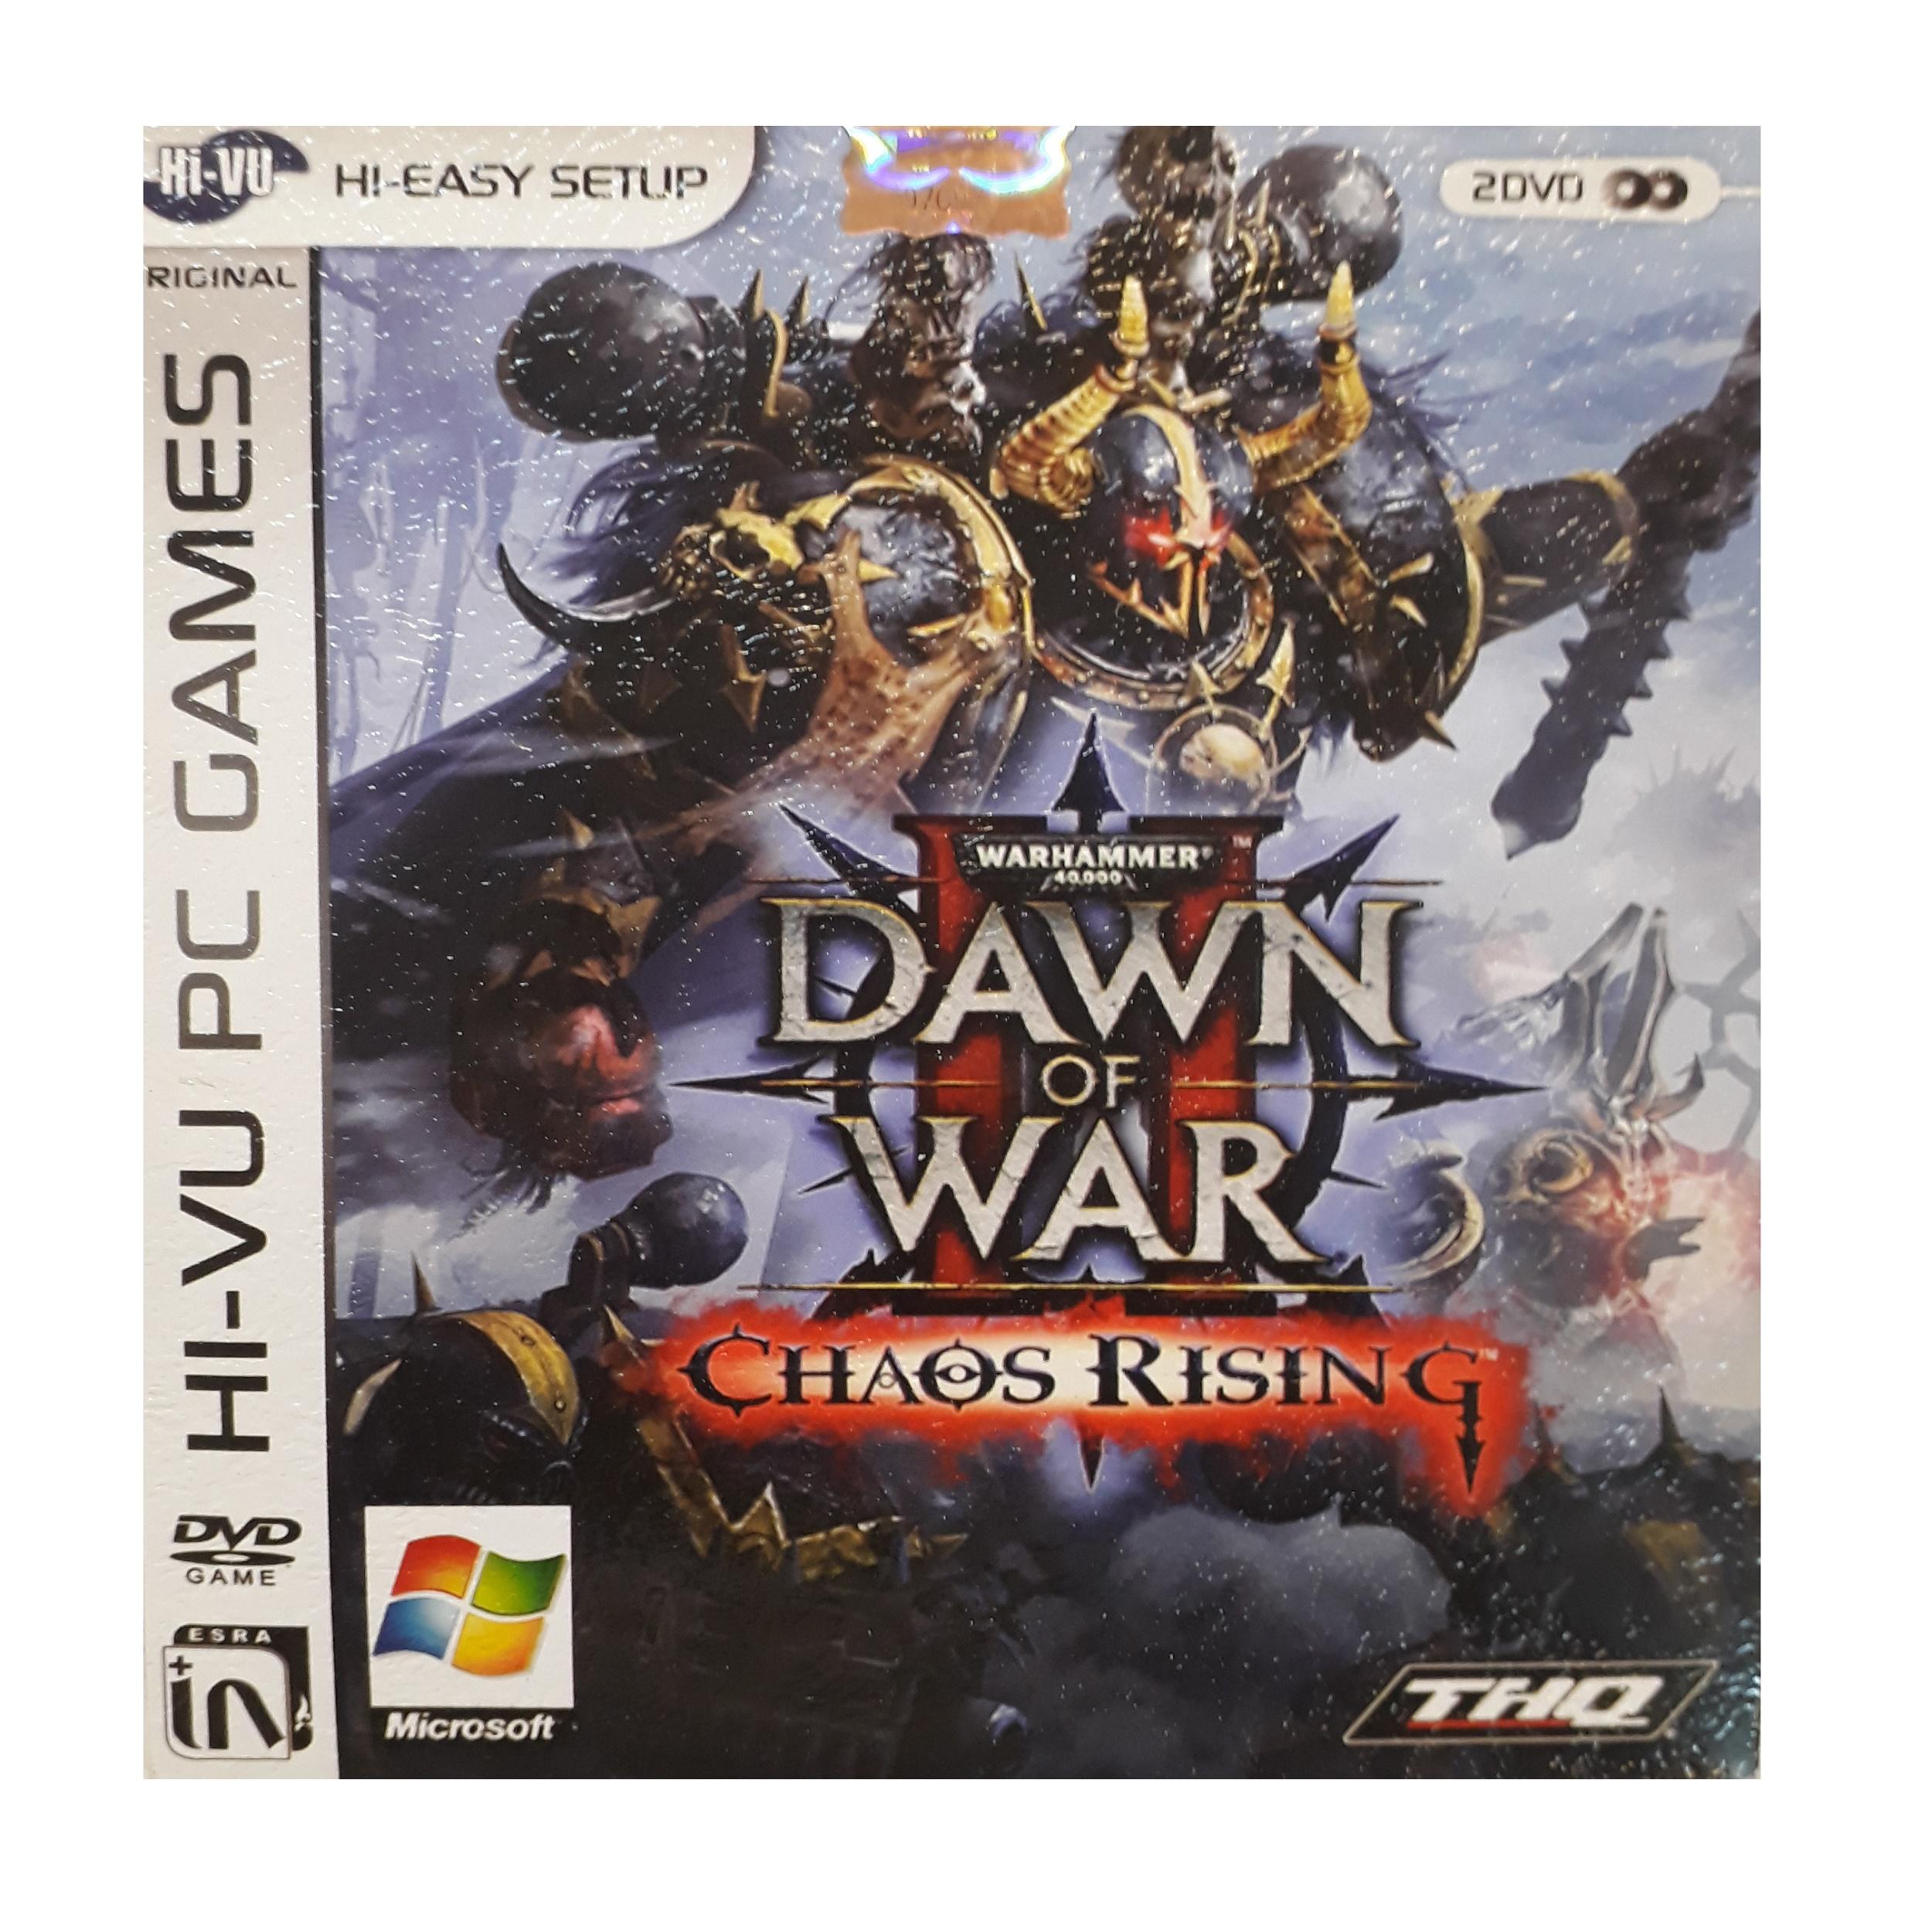 بازی dawn of war II chaos risingمخصوص pc